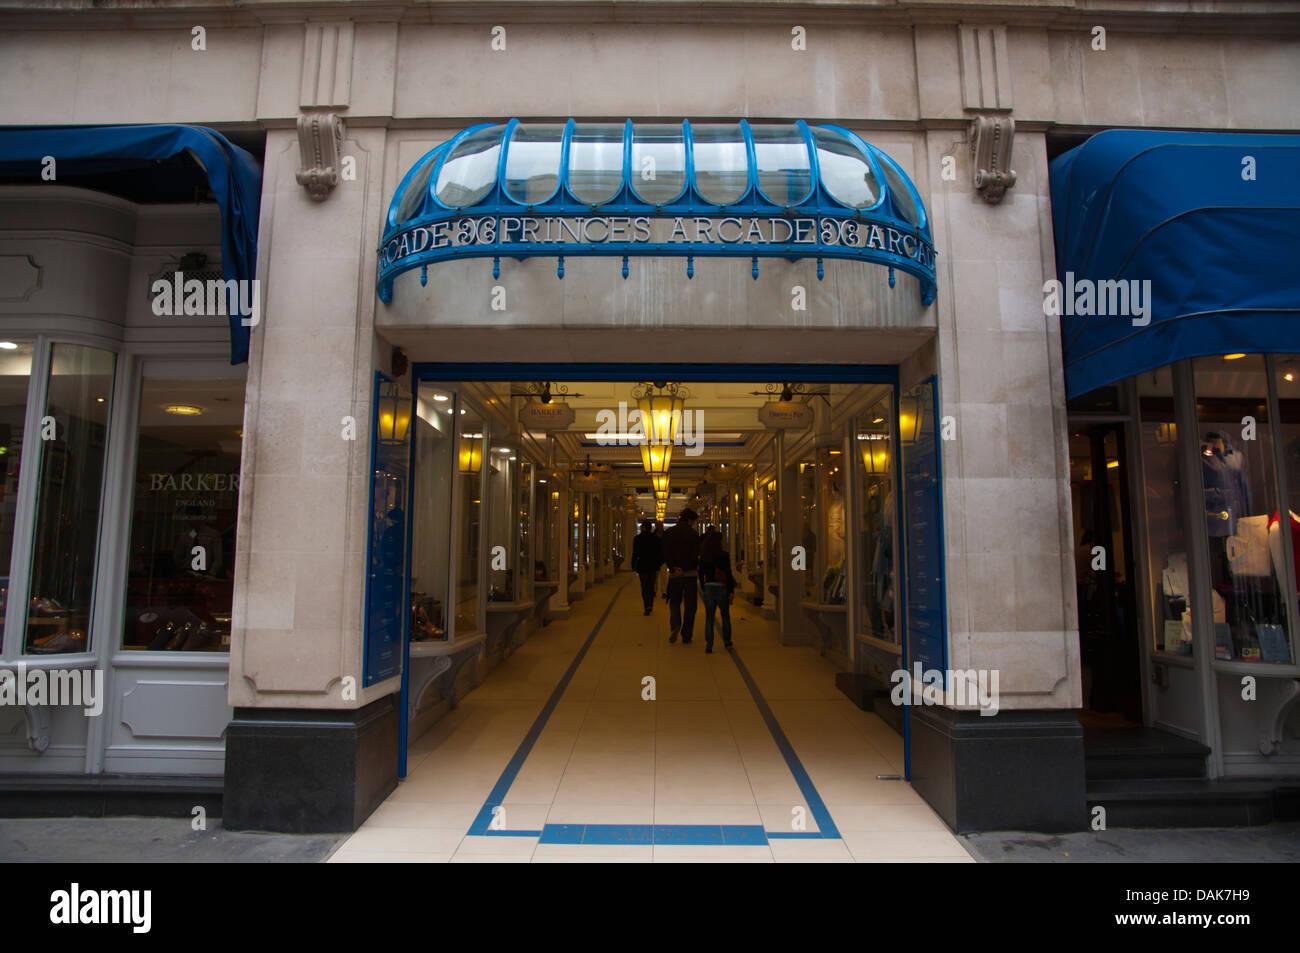 Princes Arcade shopping centre Jermyn Street St James district London England Britain UK Europe - Stock Image